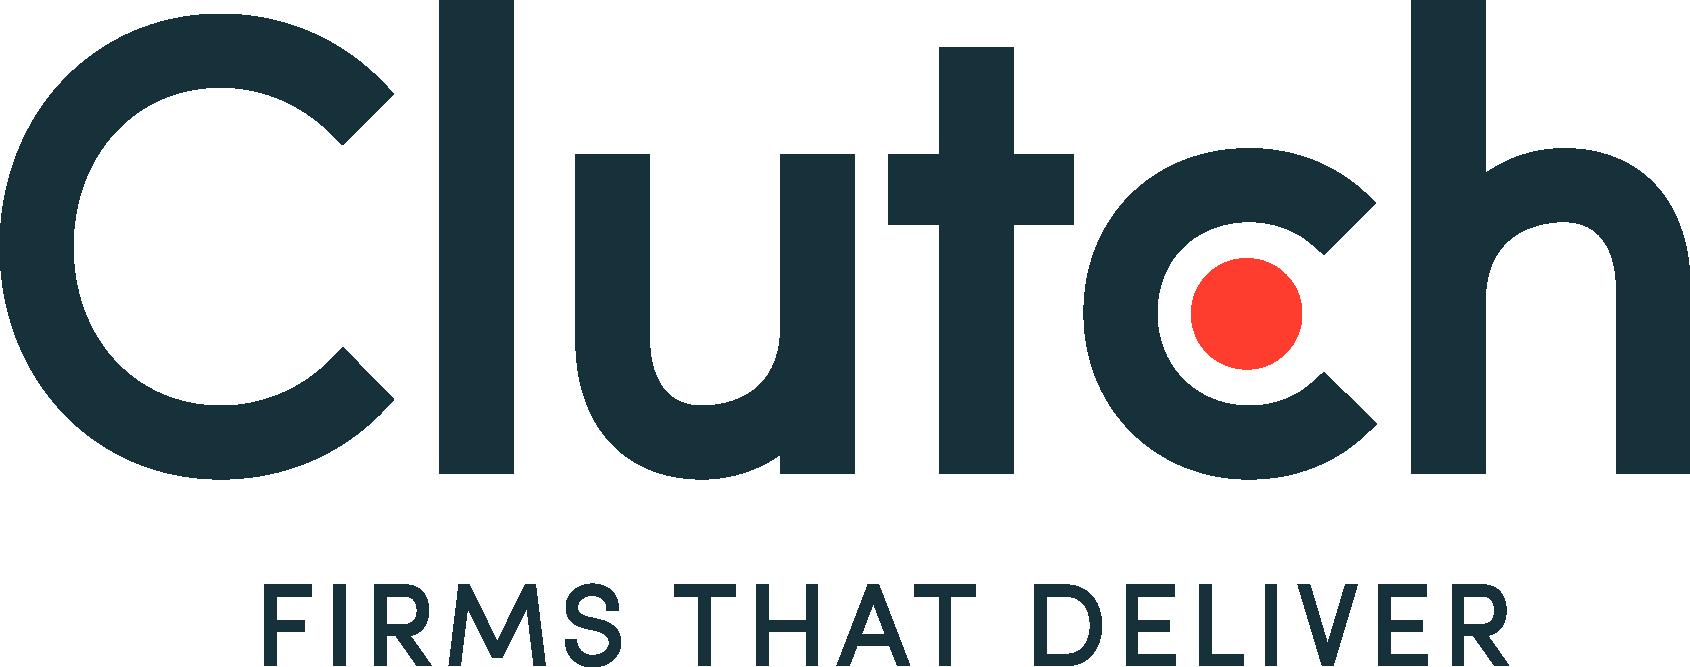 Clutch Leading Web Design Agency